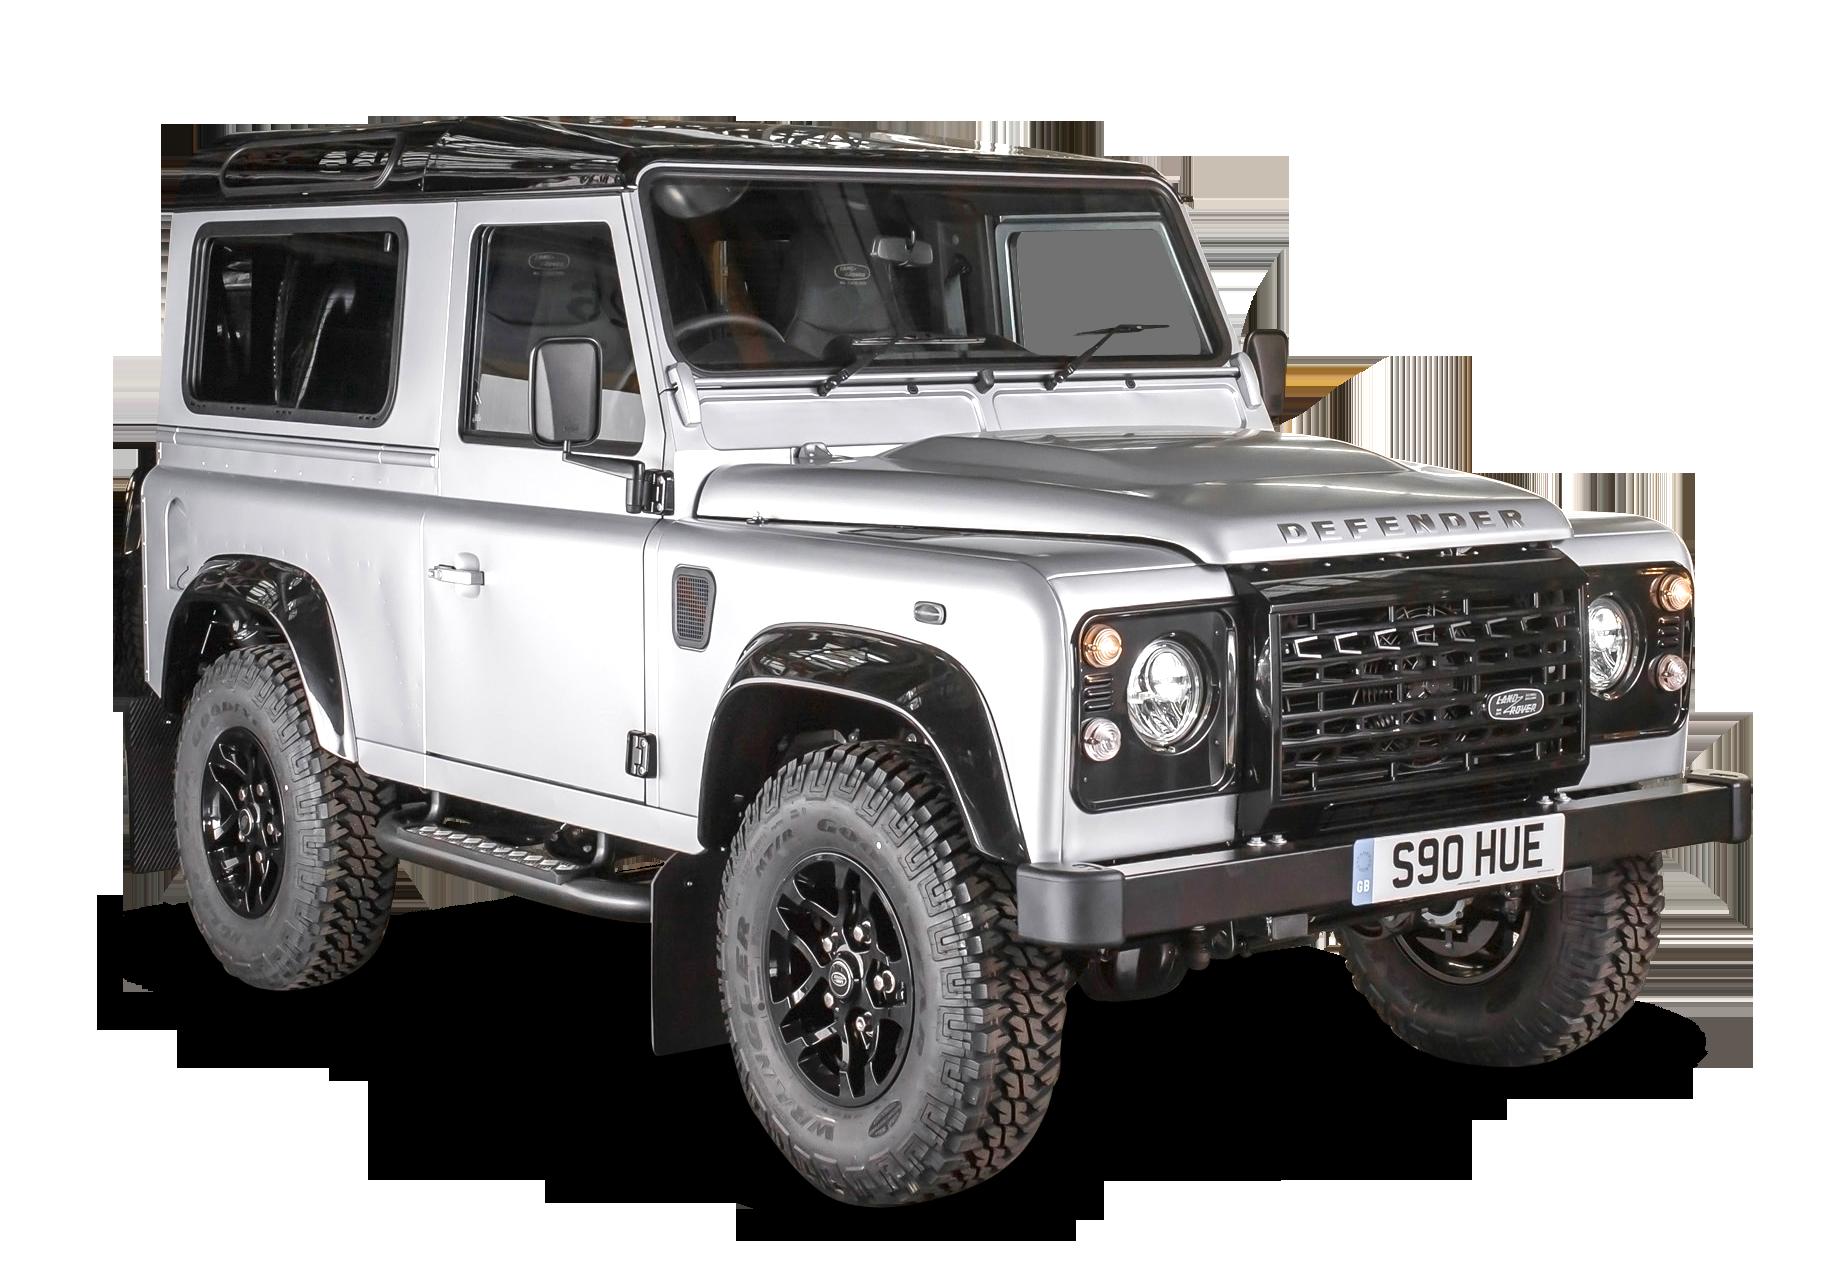 White Land Rover Defender Car PNG Image